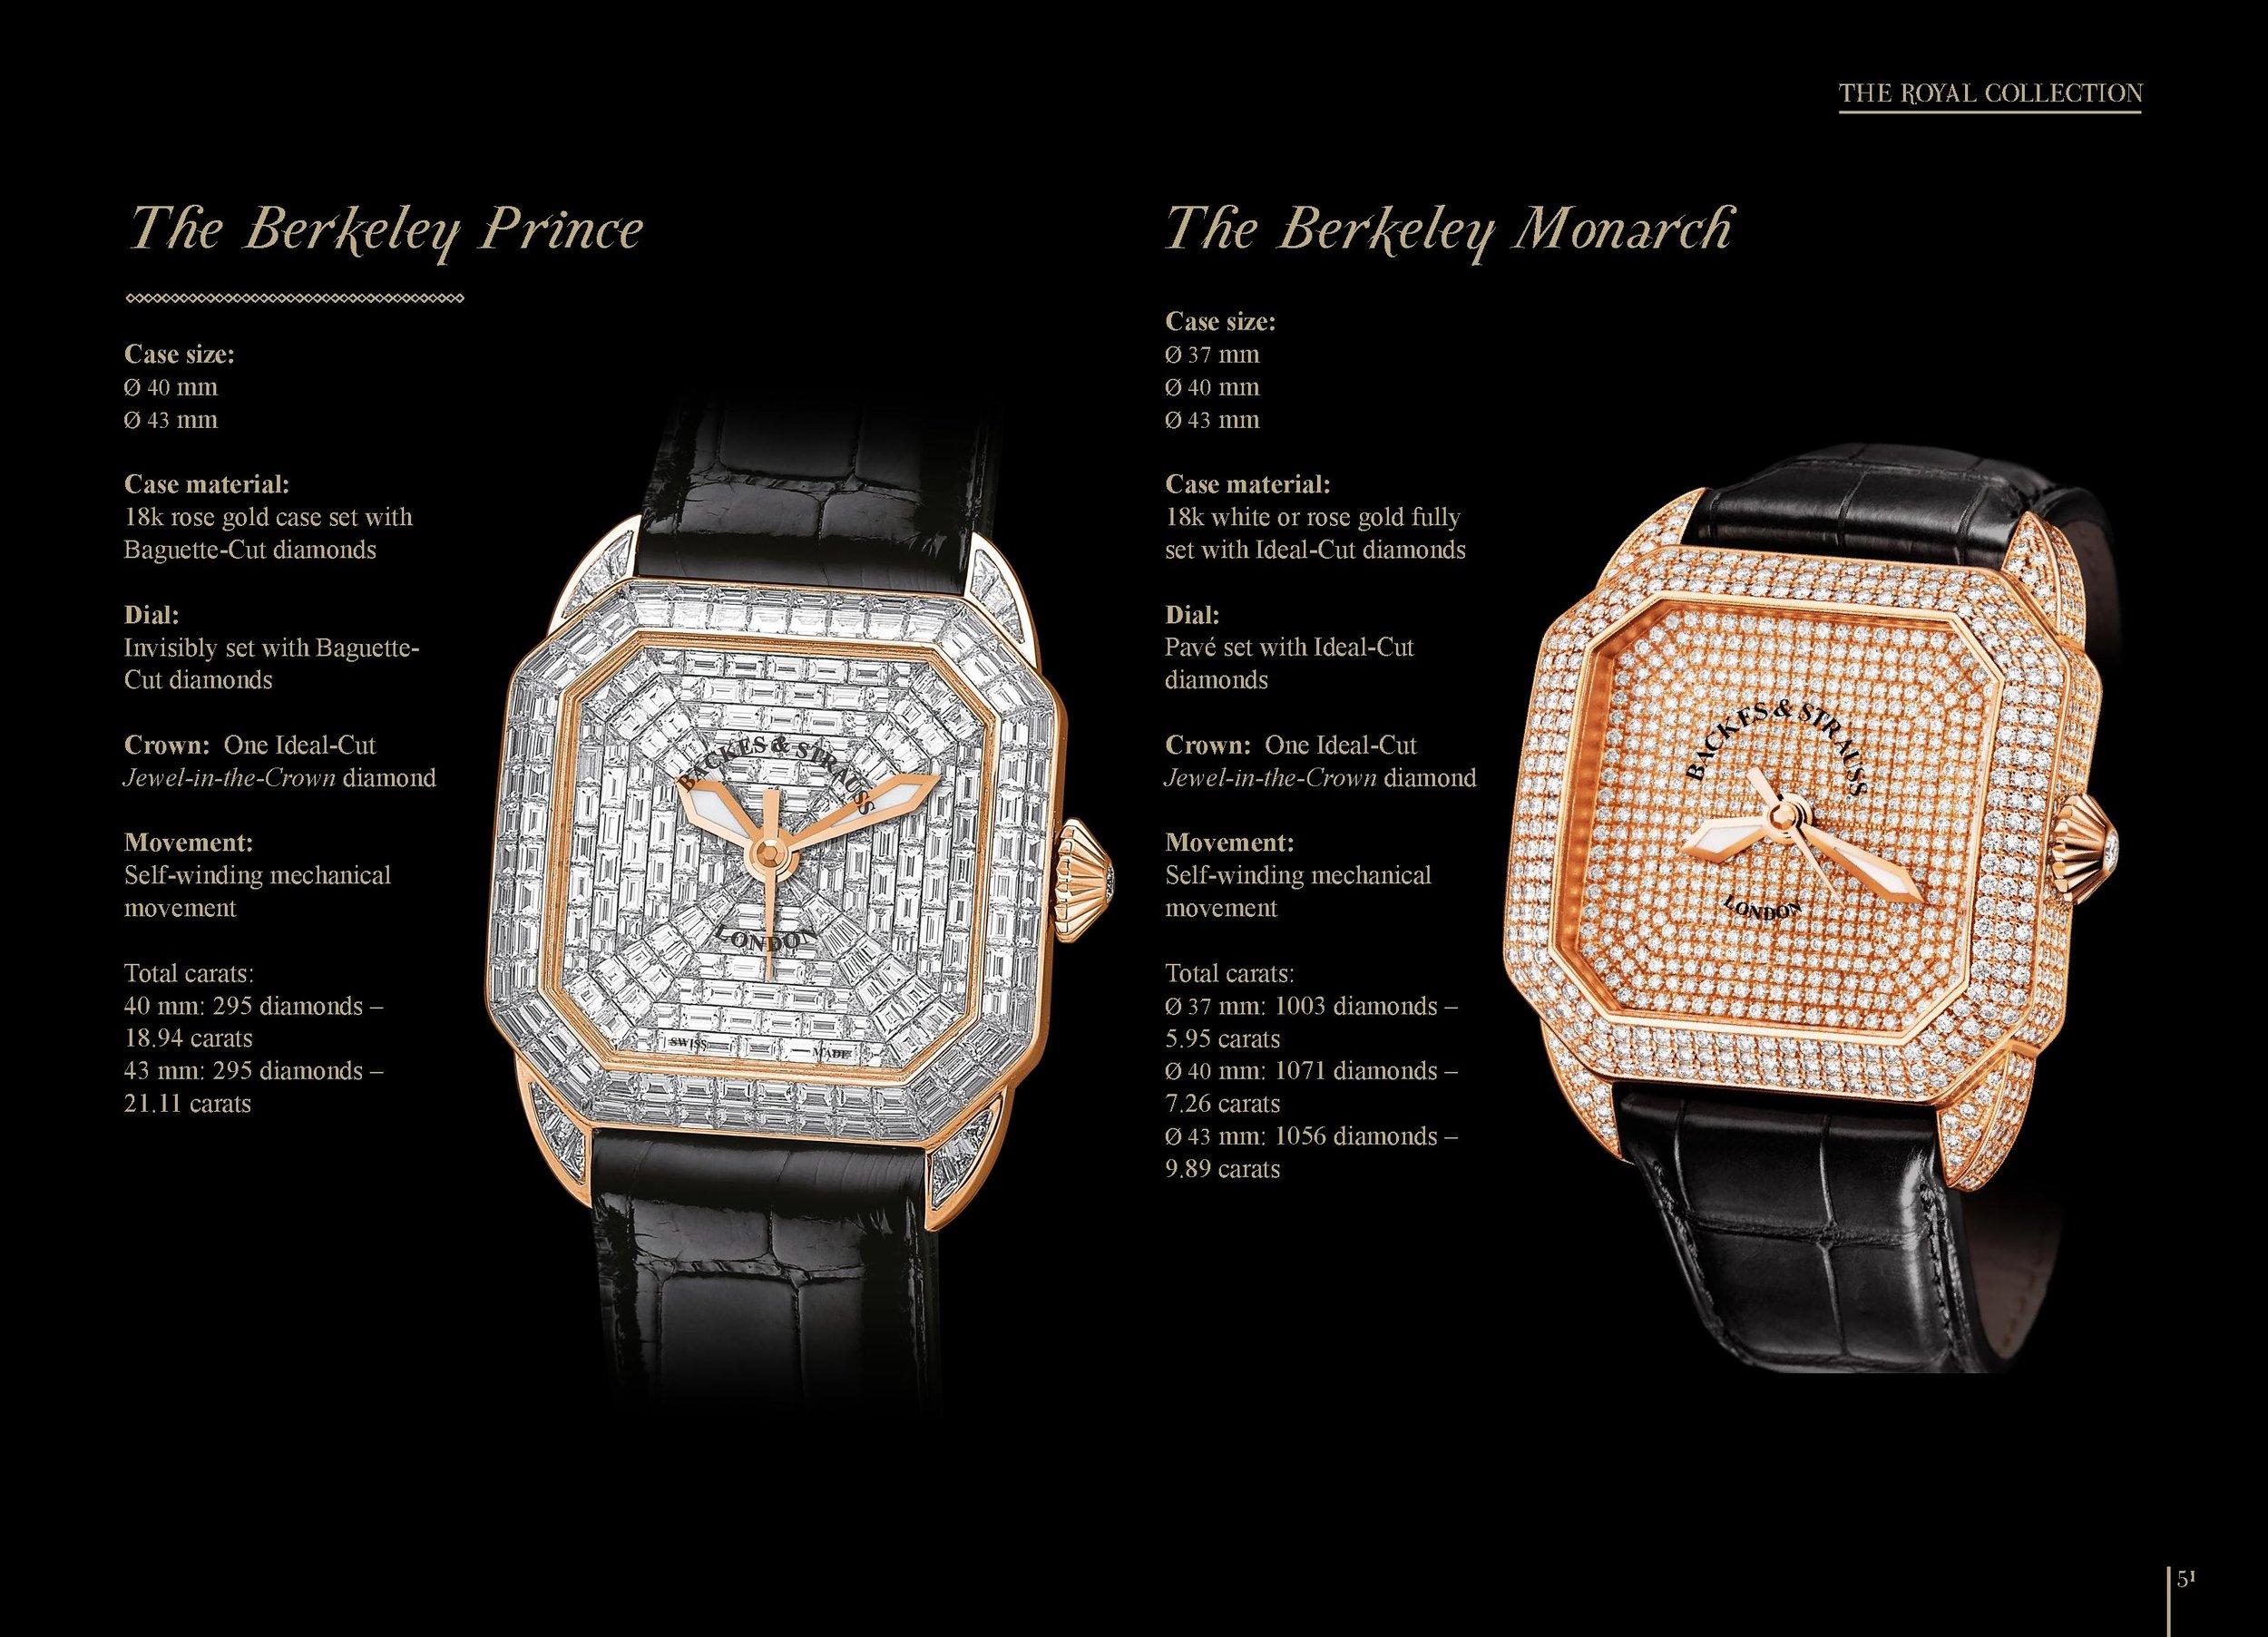 The Berkeley Monarch and Prince diamond watch